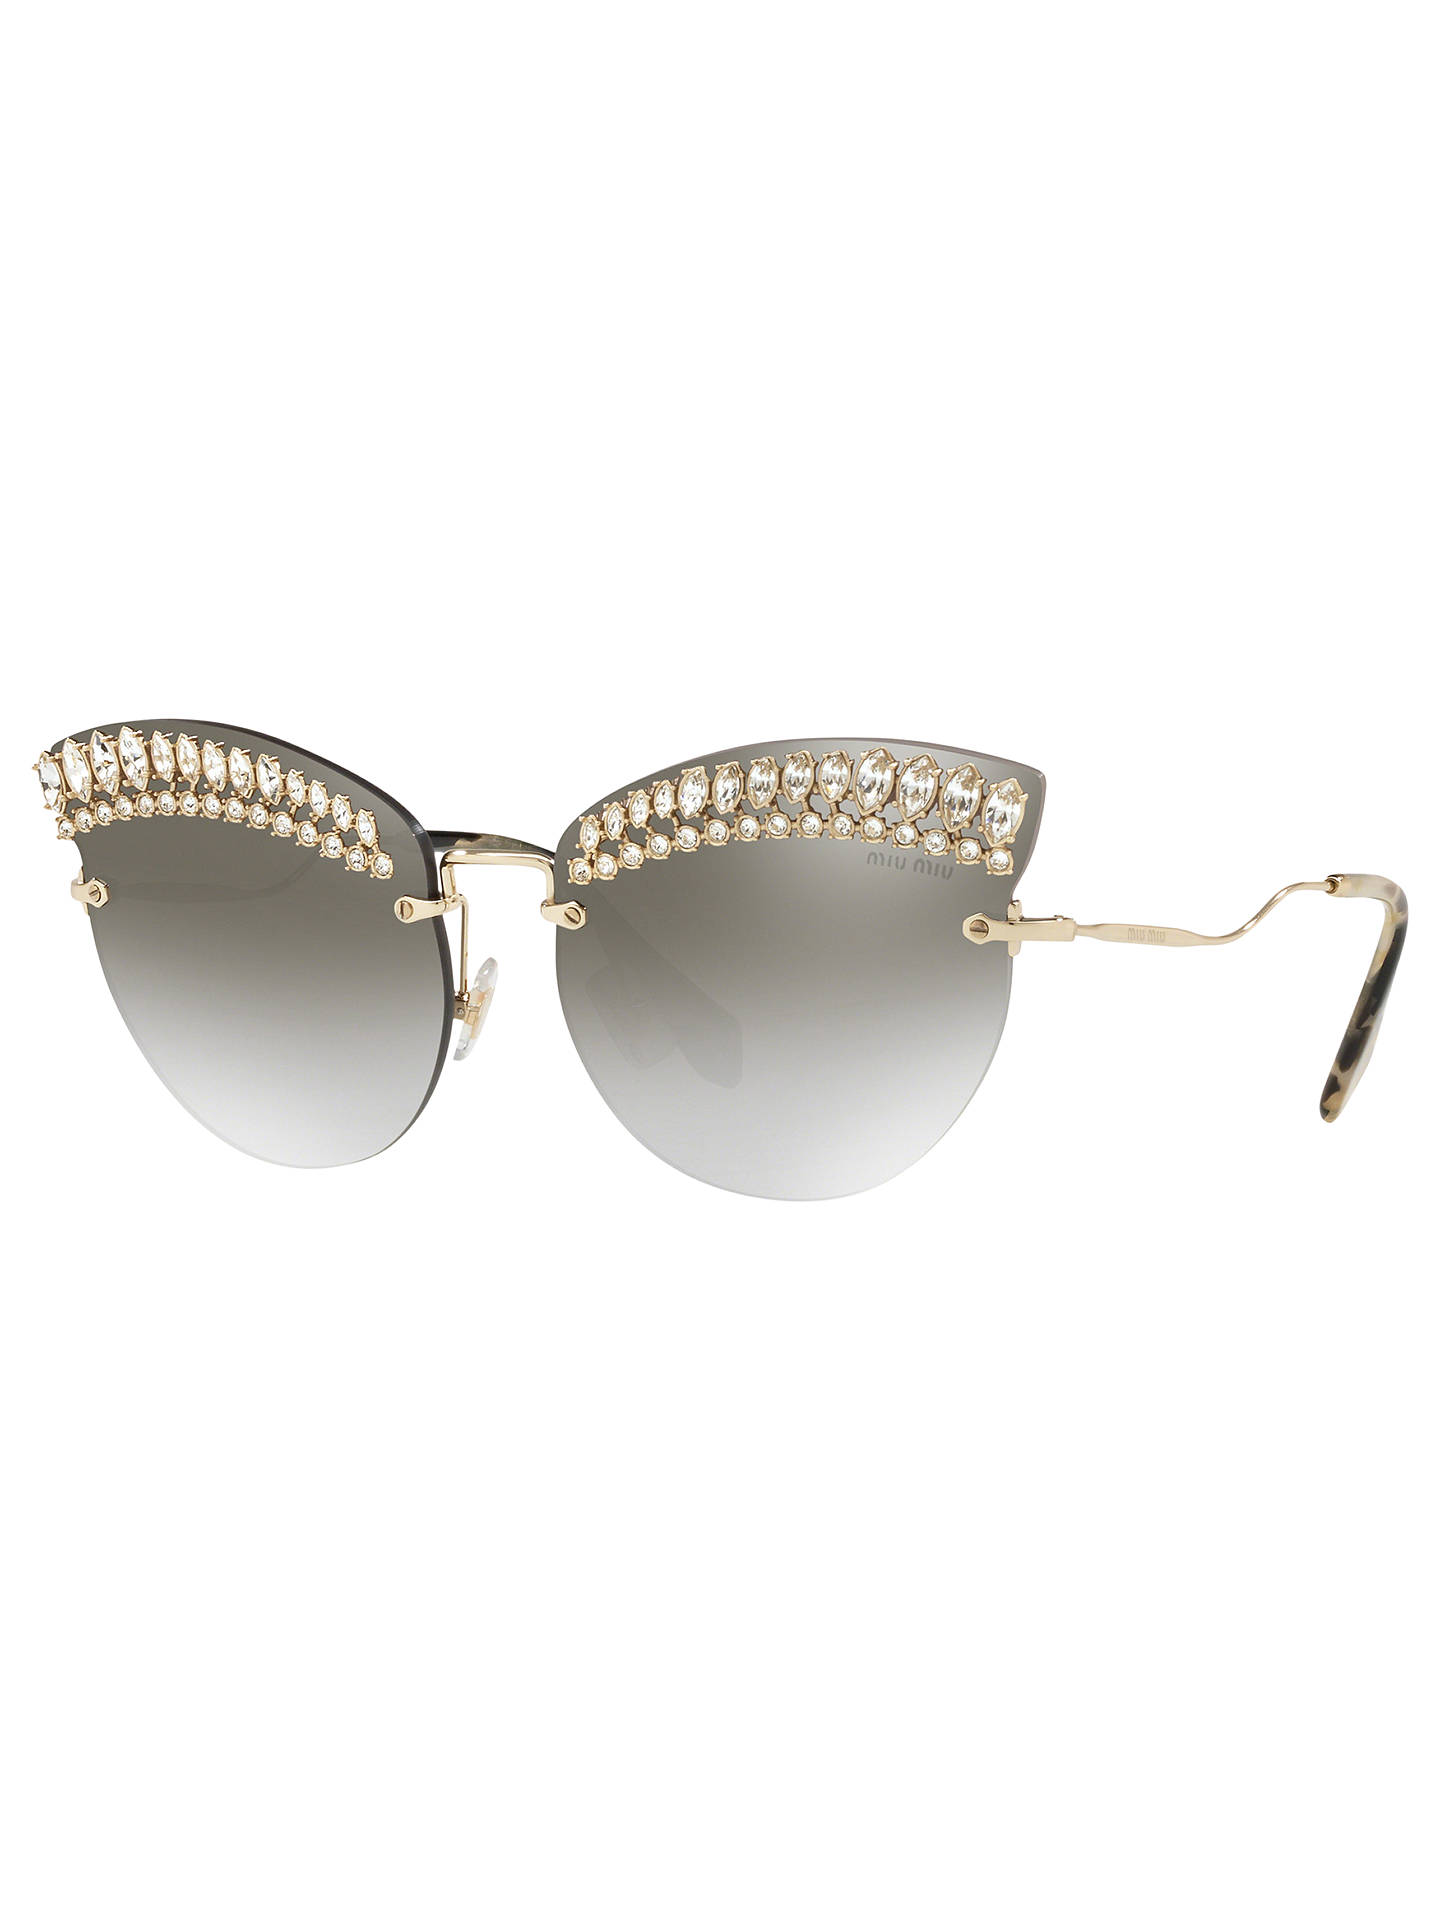 253ced4a1526 Miu Miu MU 58TS Women s Crystal Embellished Cat s Eye Sunglasses at ...